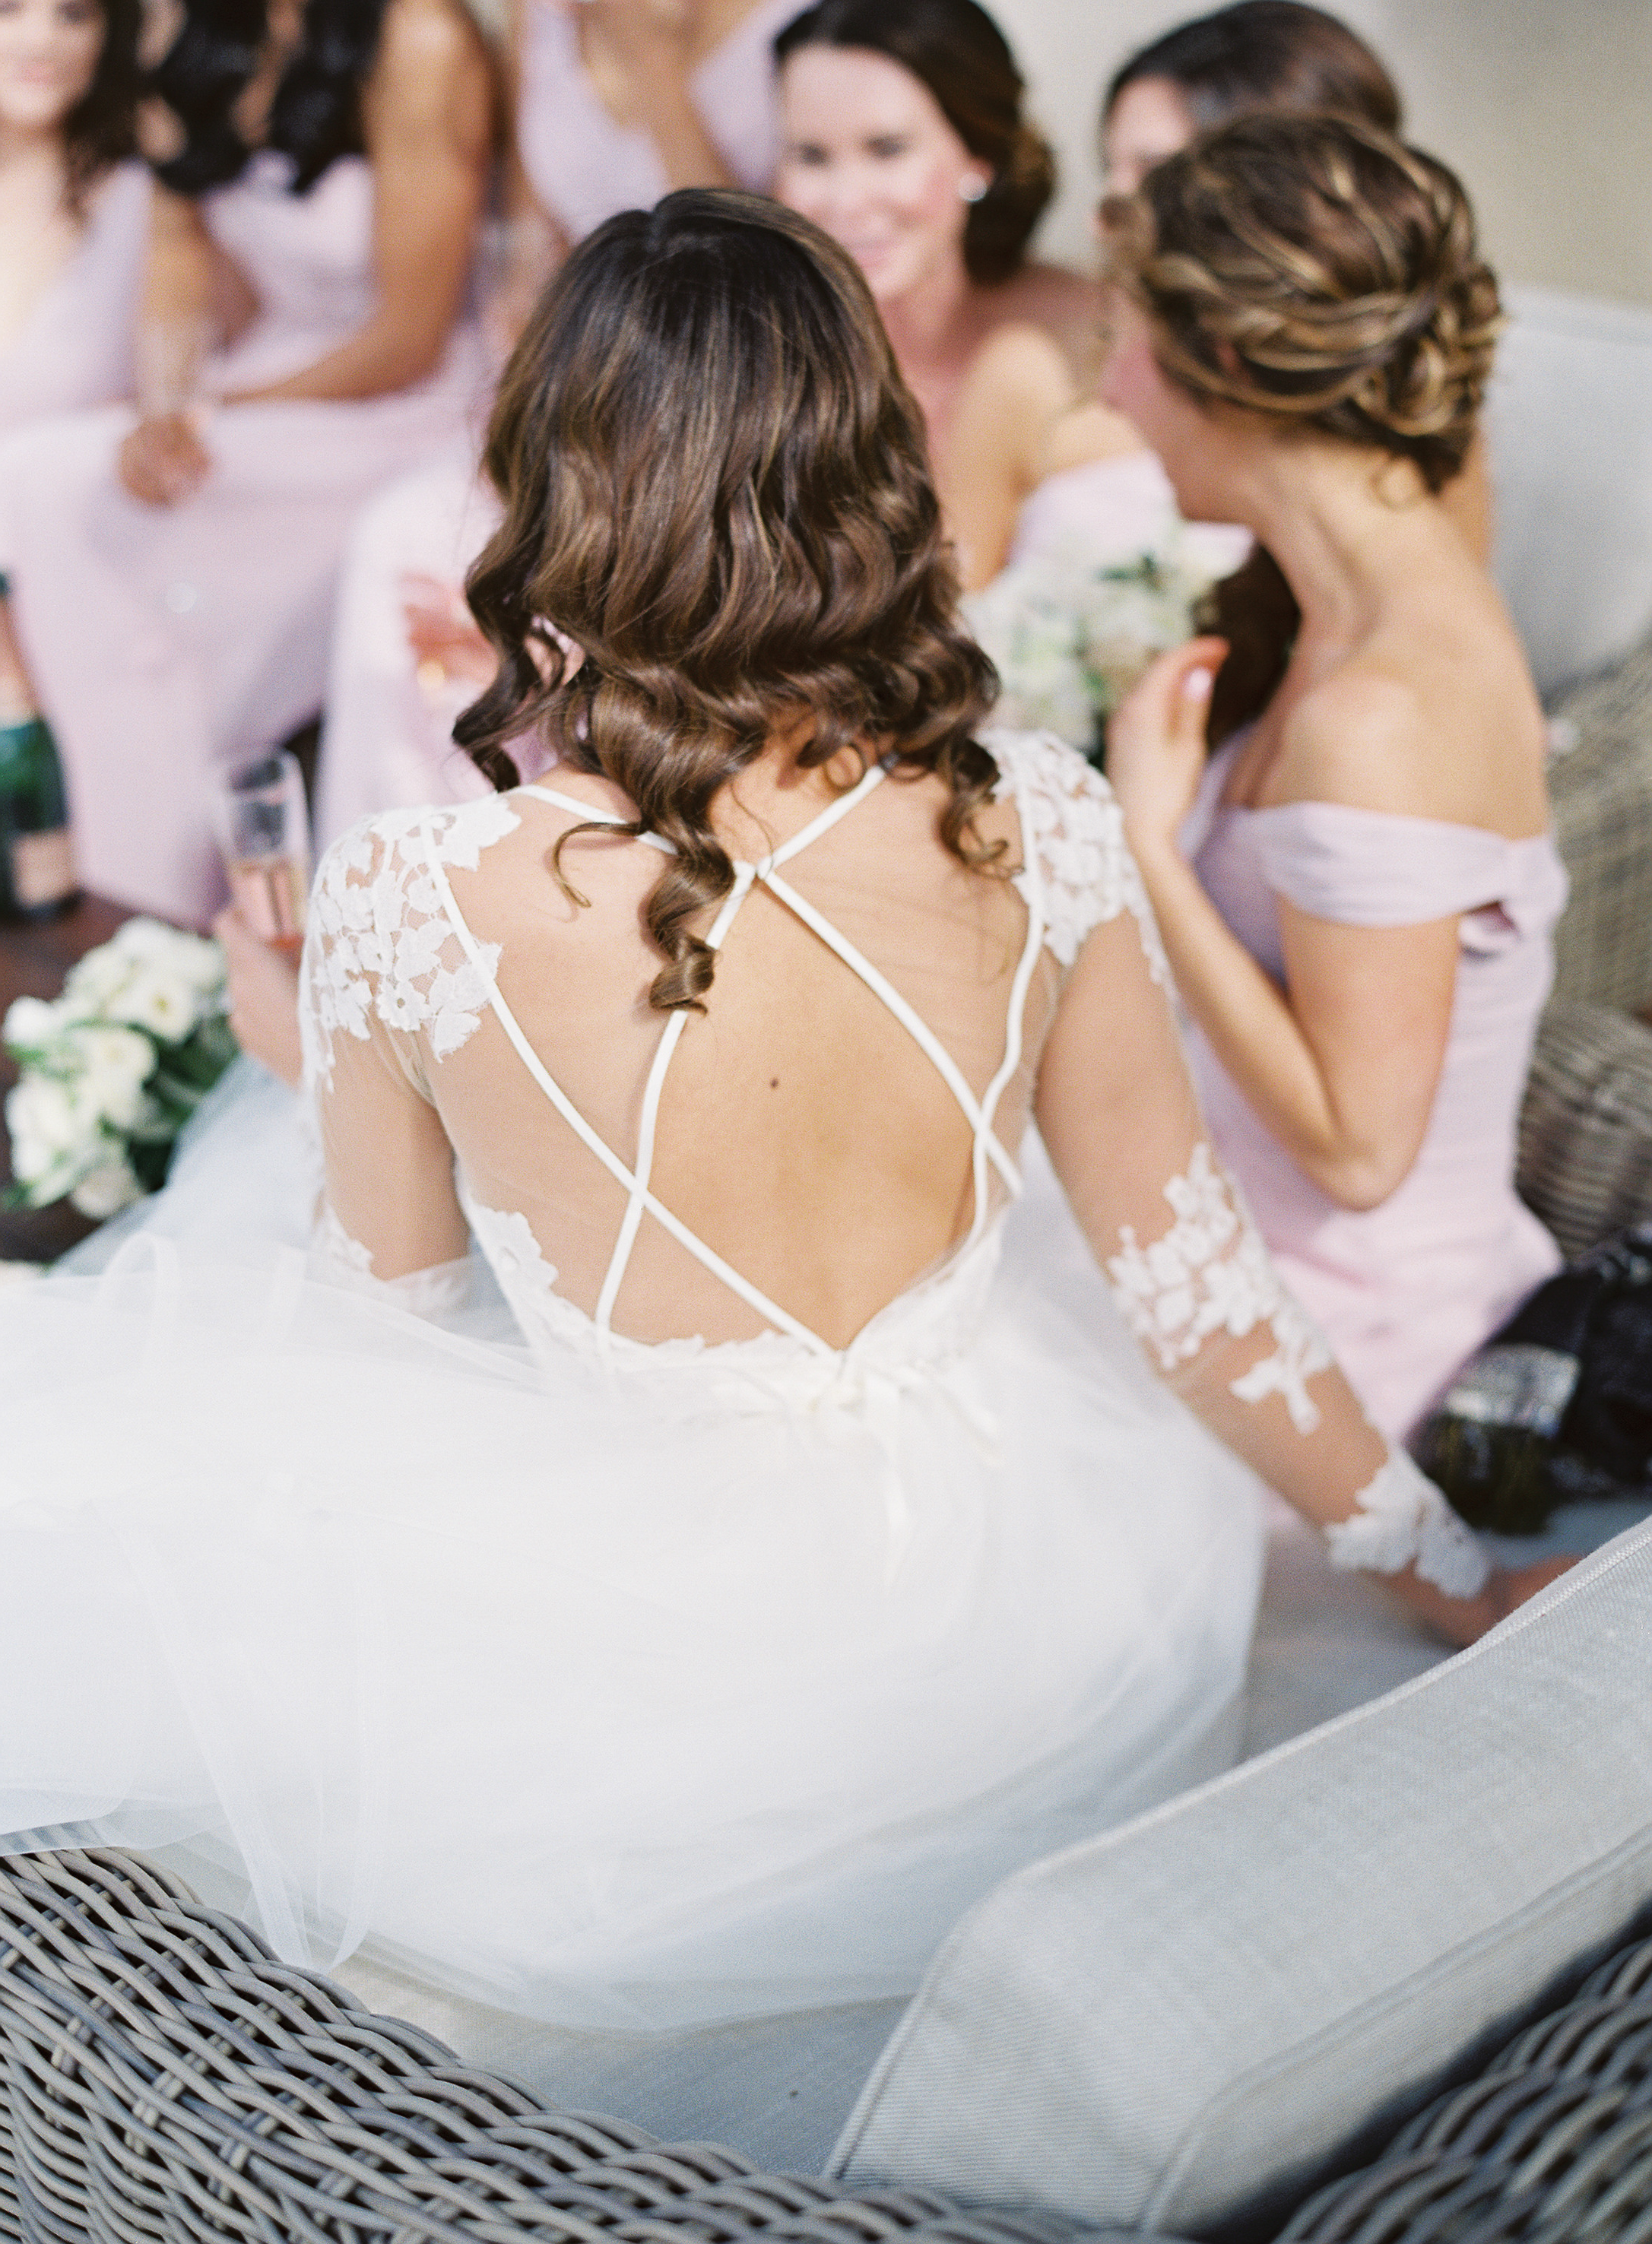 Meghan Mehan Photography   Fine Art Film Wedding Photographer   California   San Francisco   Napa   Sonoma   Santa Barbara   Big Sur   Destination Wedding Photographer 019.jpg